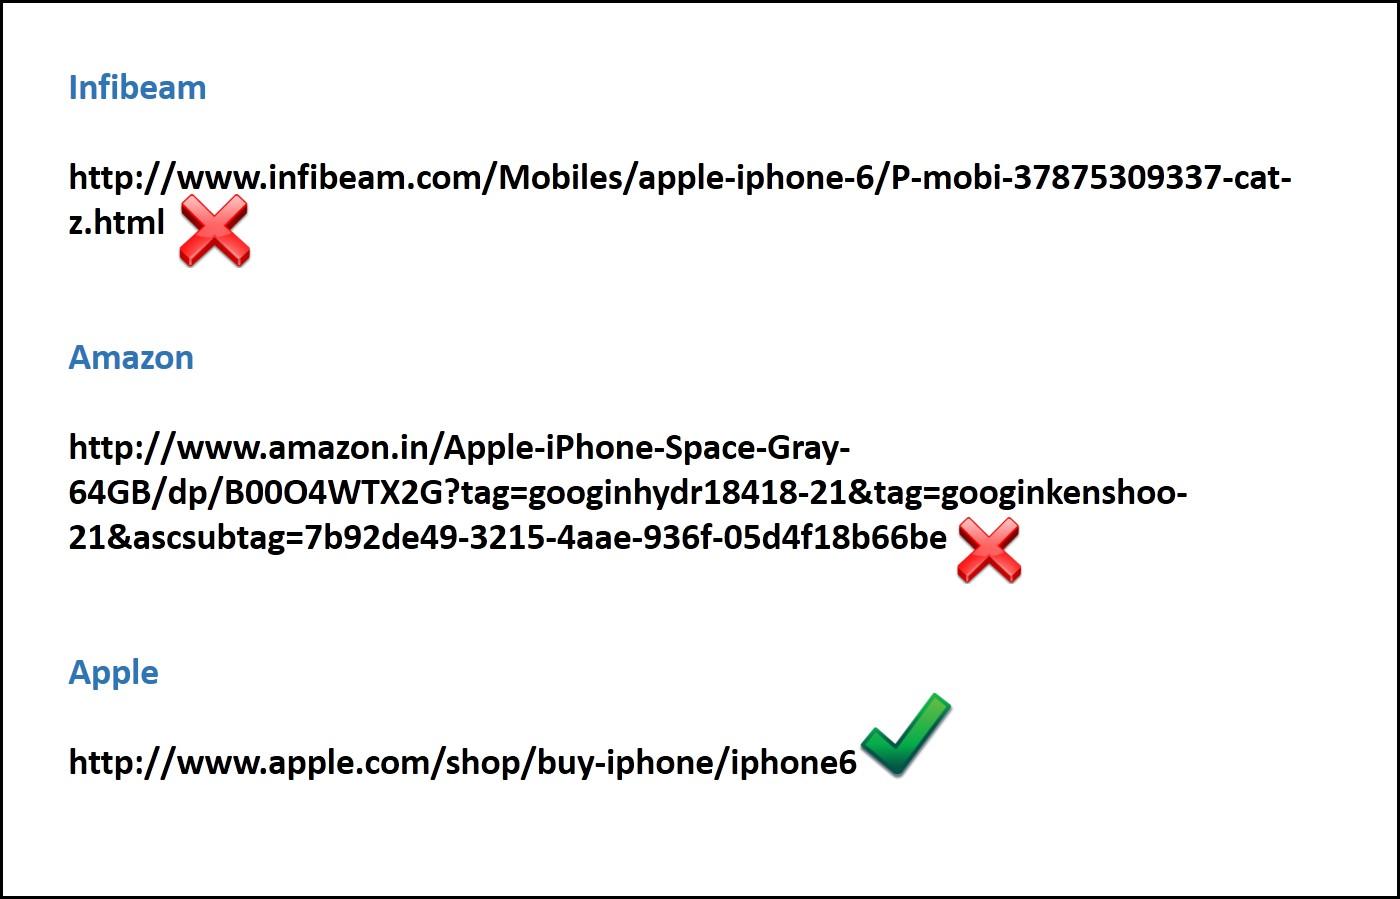 10seos_url_comparison.jpg